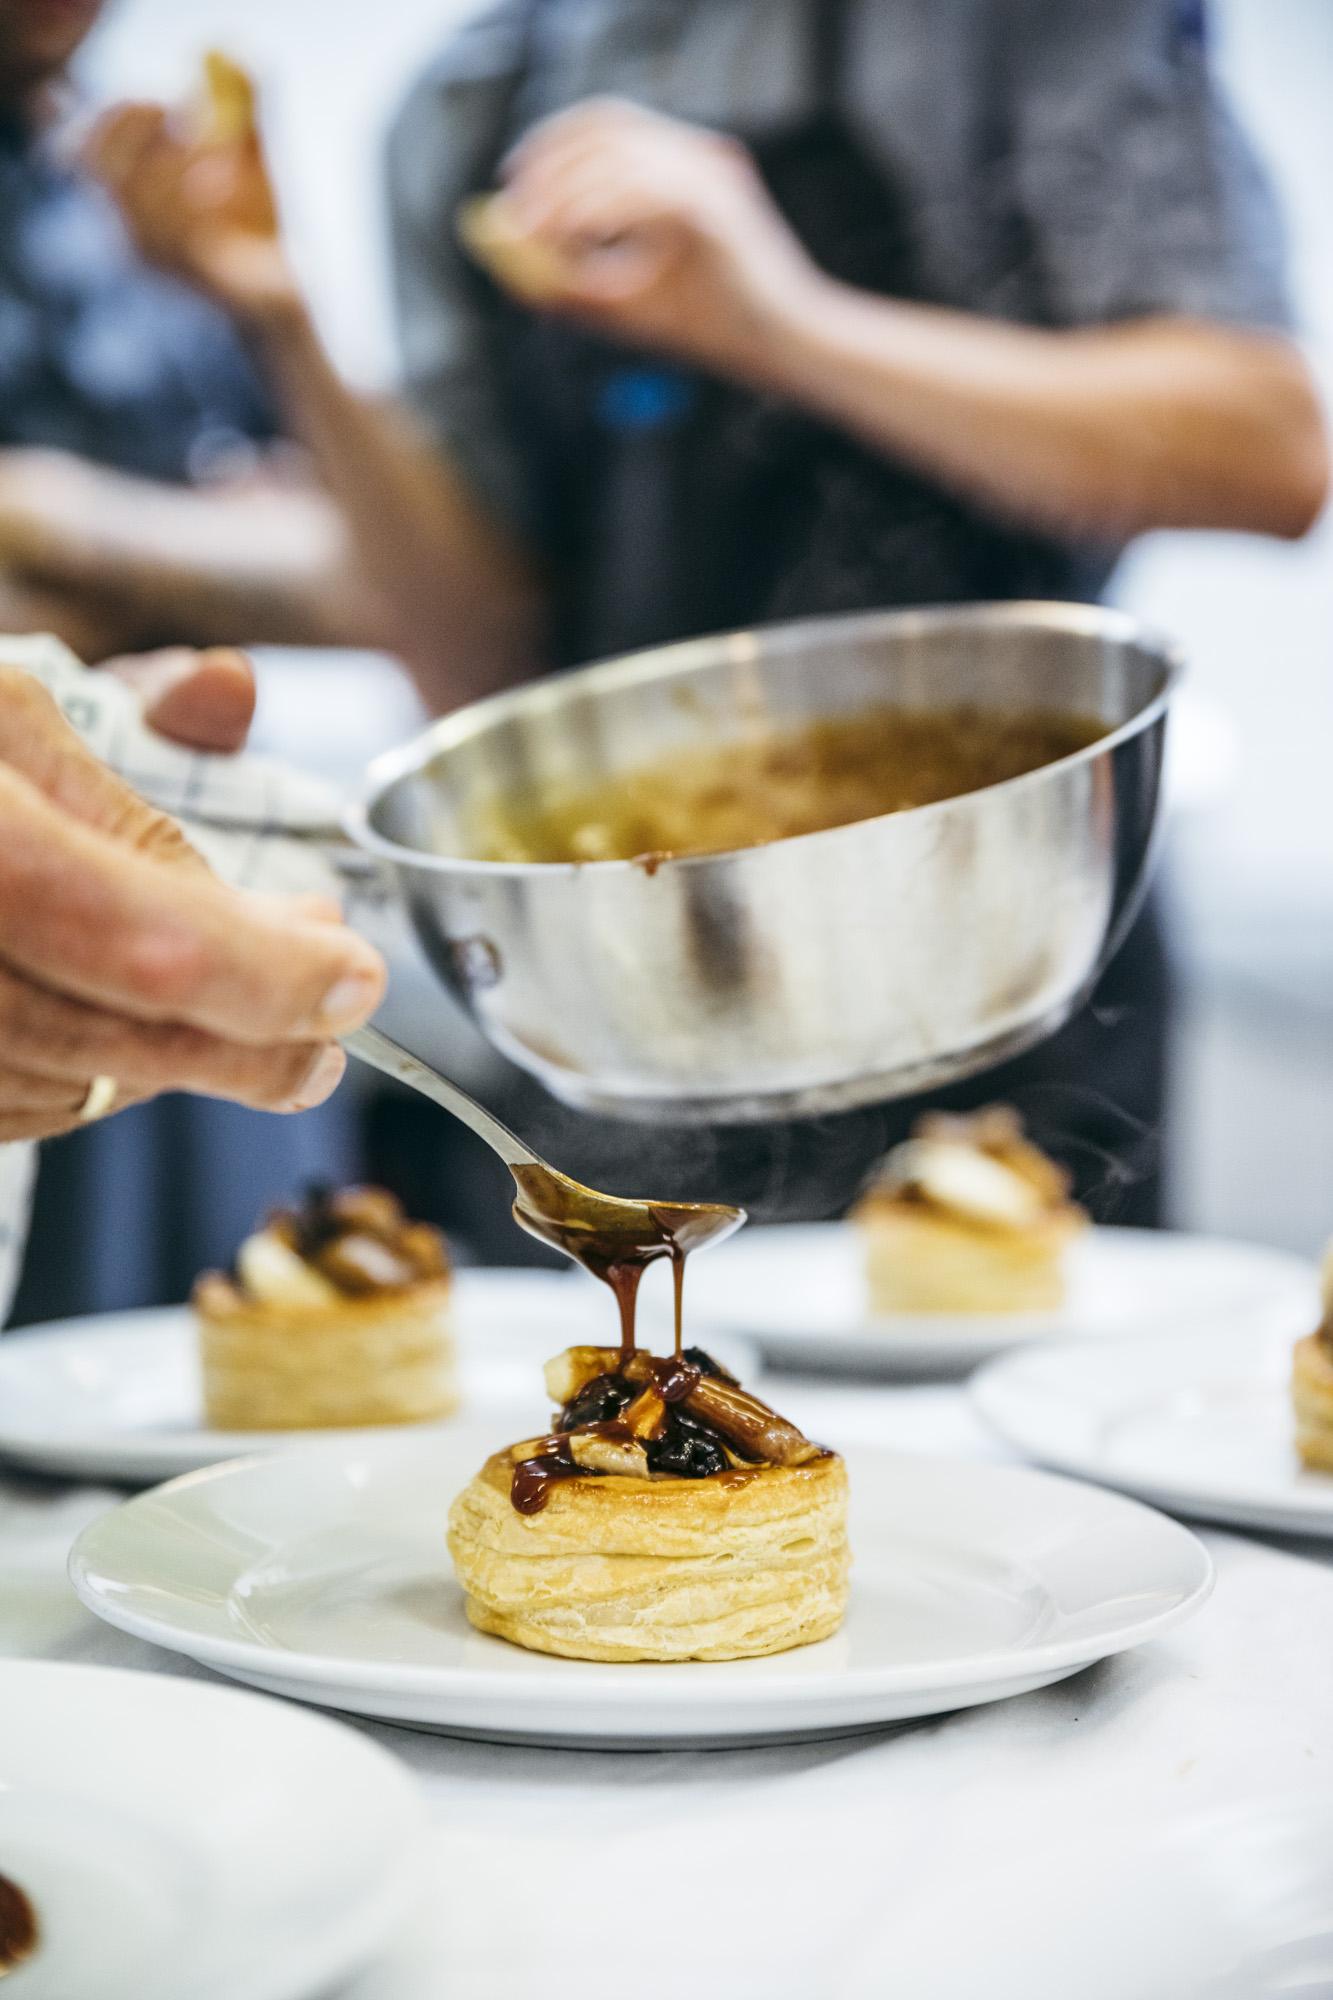 Andreas_Raun_Food Organisation of Denmark - Chief Cooking School36.jpg